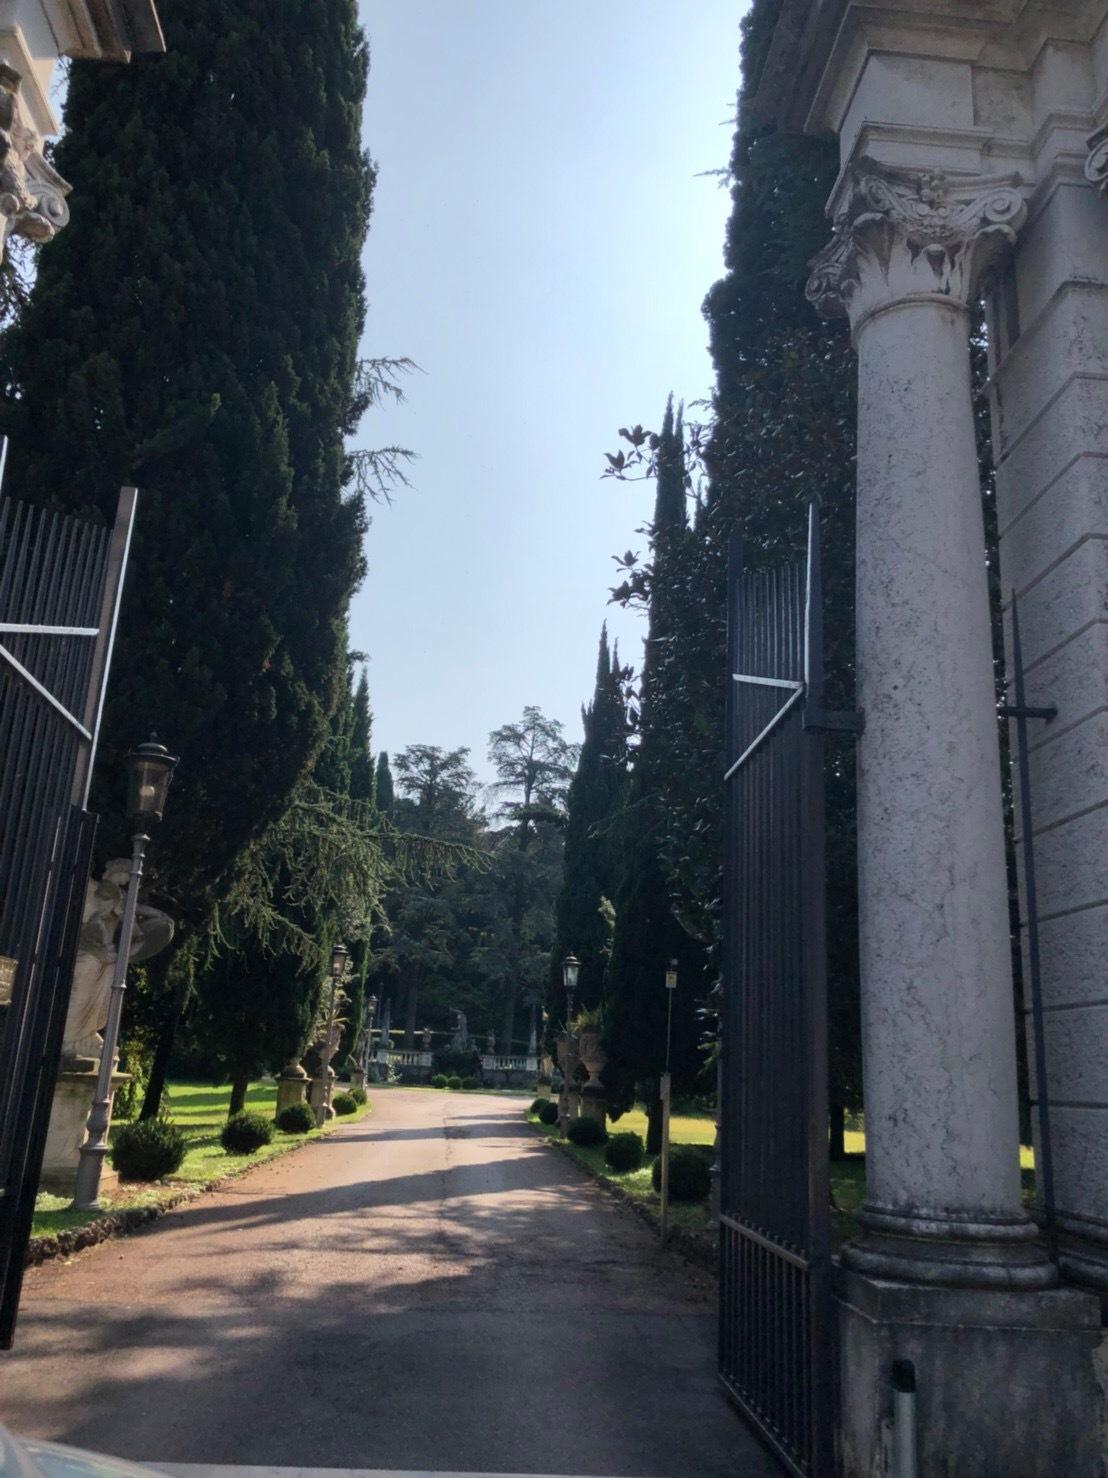 Villa cortine_a0129711_19415872.jpg